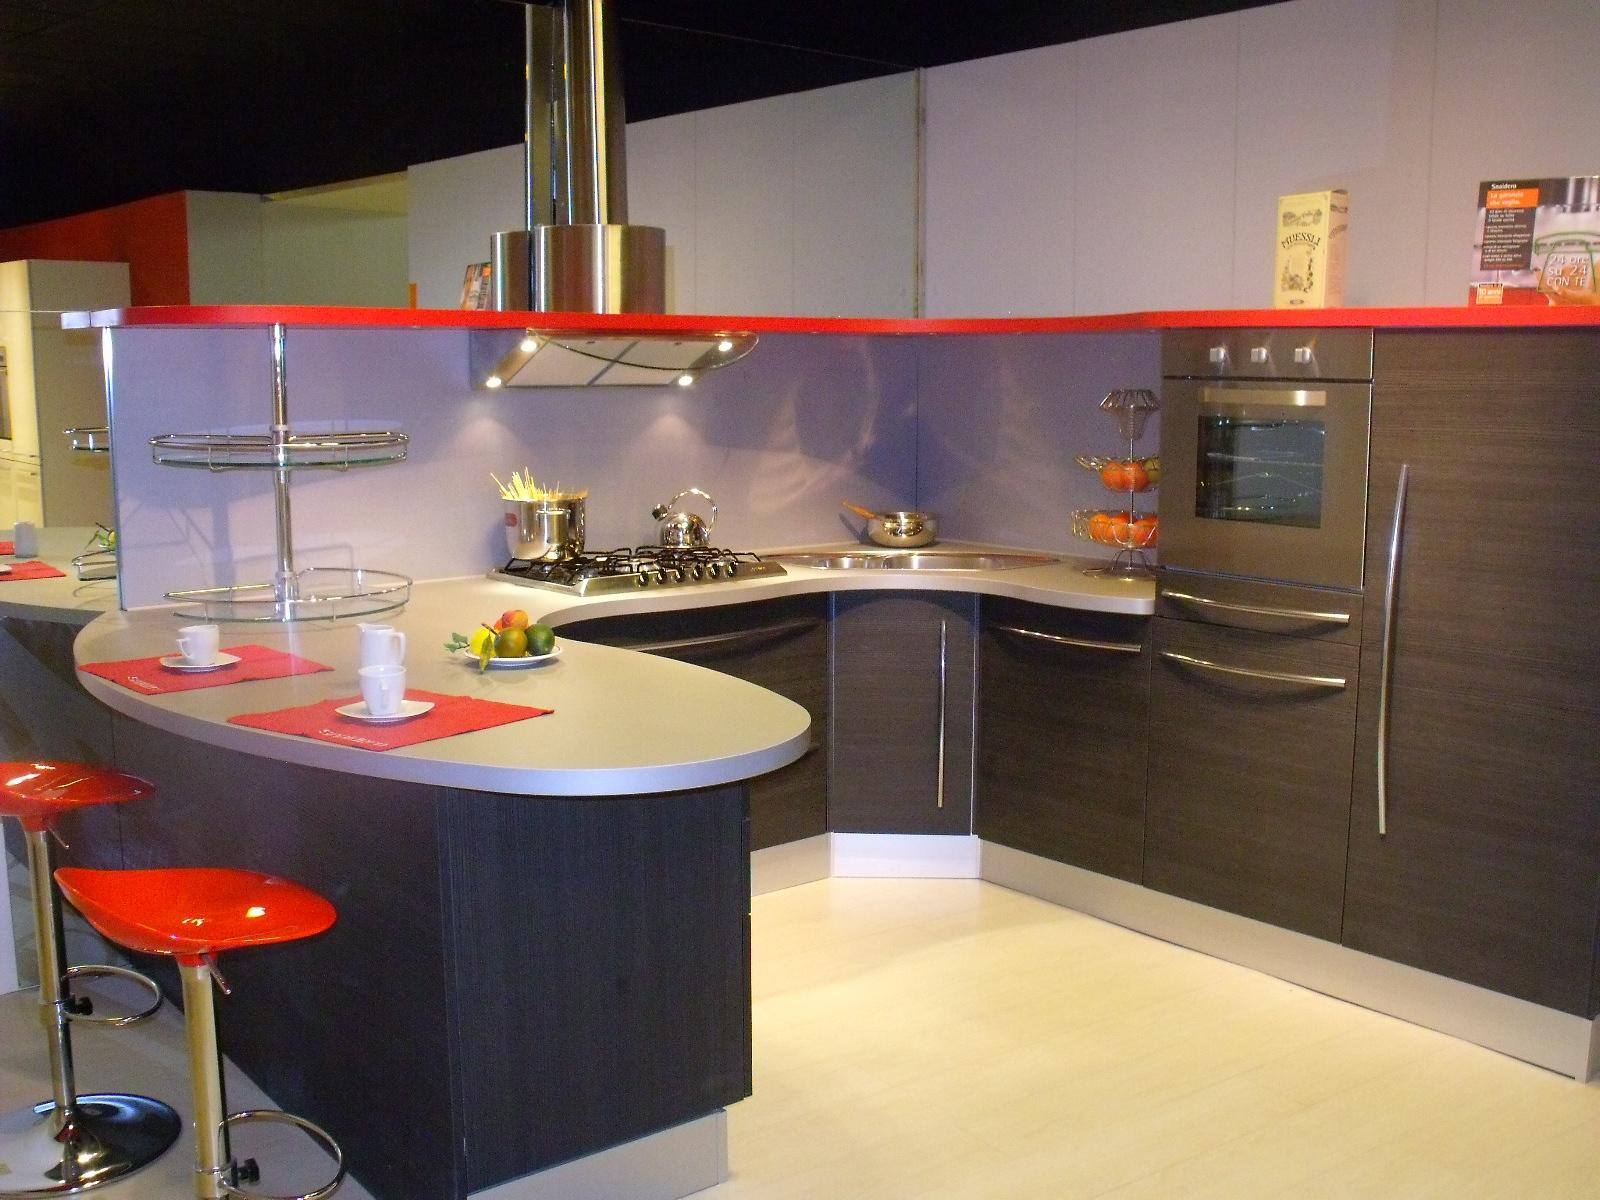 Comporre la cucina elegant stunning progettare cucina ikea pictures ideas design with comporre - Comporre la cucina ...